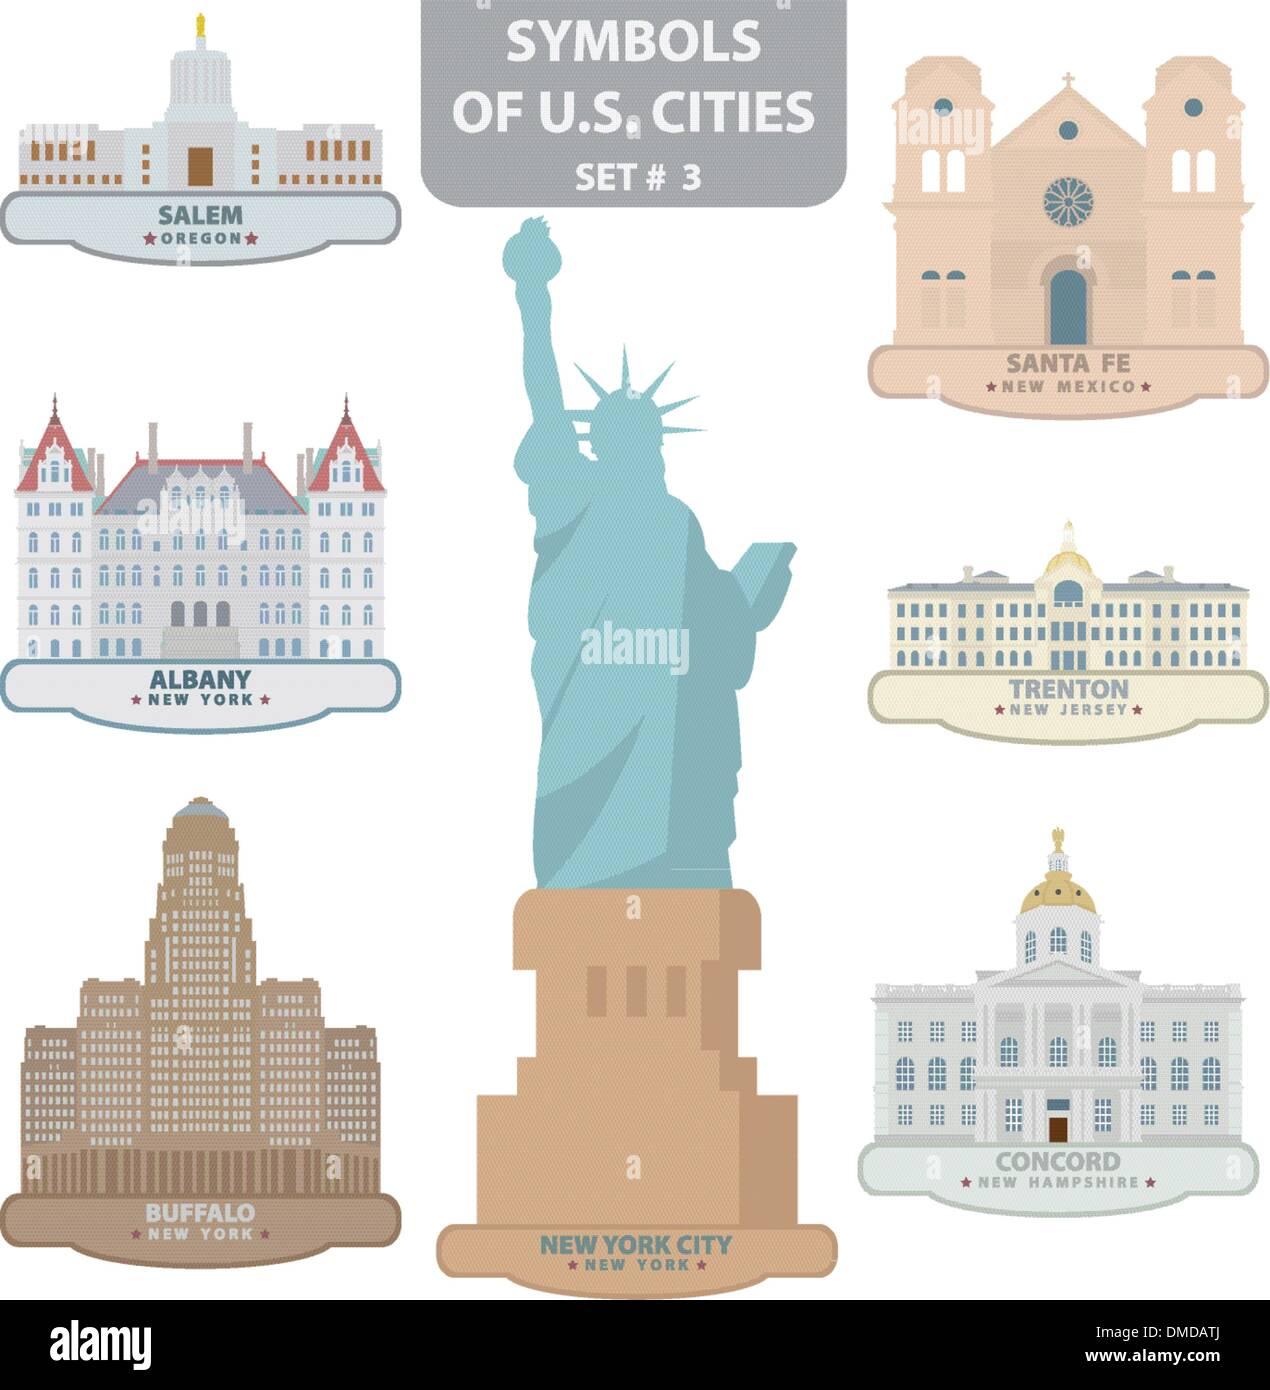 Symbols Of Us Cities Stock Vector Art Illustration Vector Image